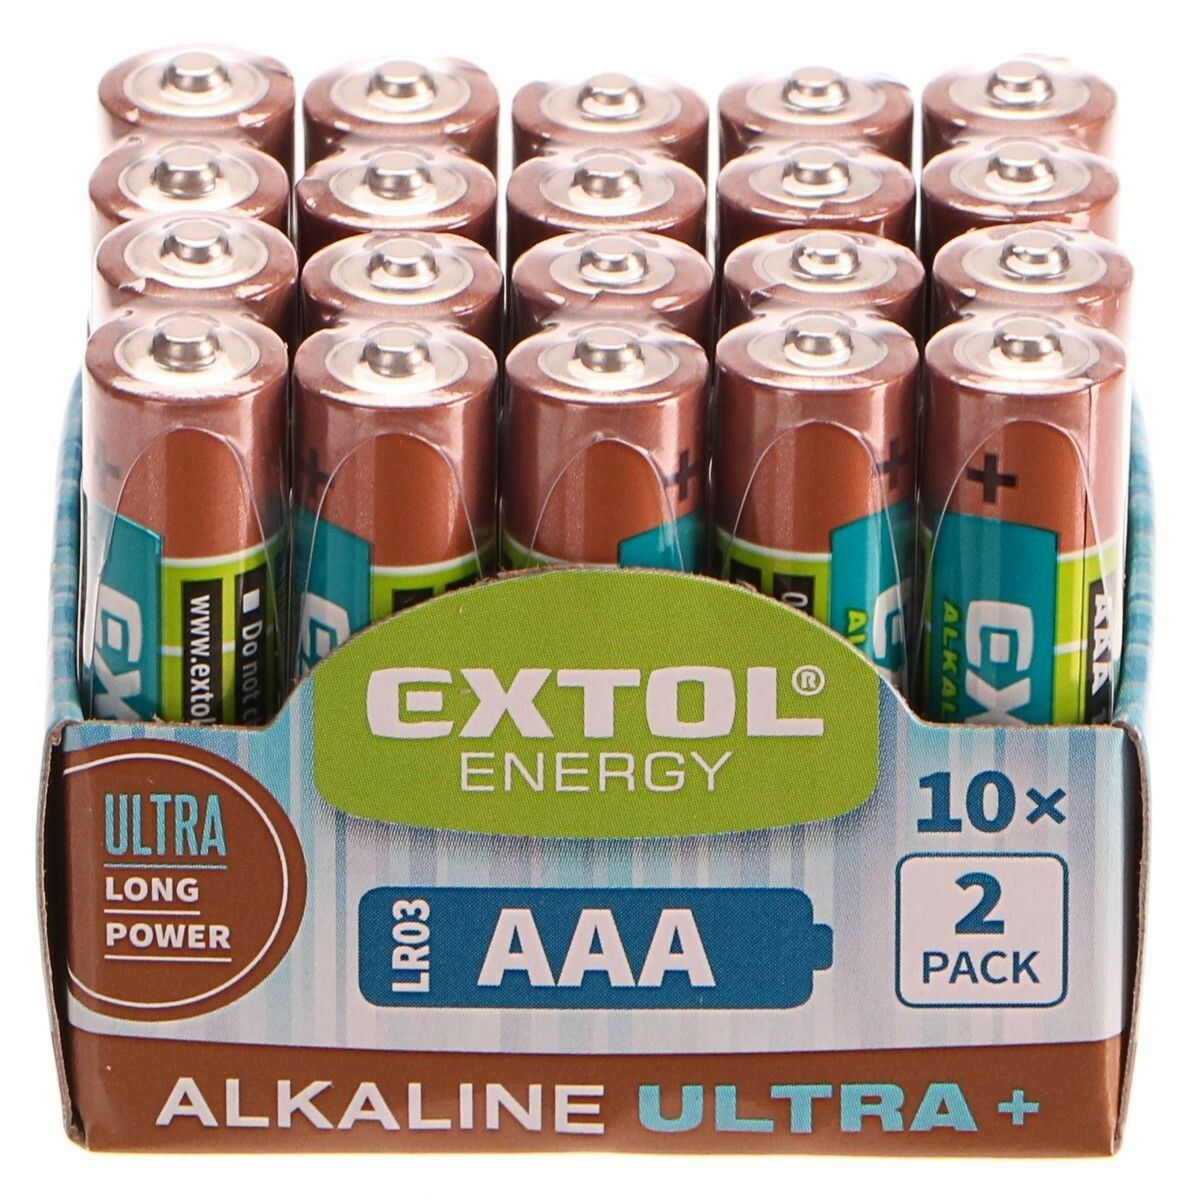 Baterie alkalické EXTOL ENERGY ULTRA +, 20ks, 1,5V AAA (LR03)